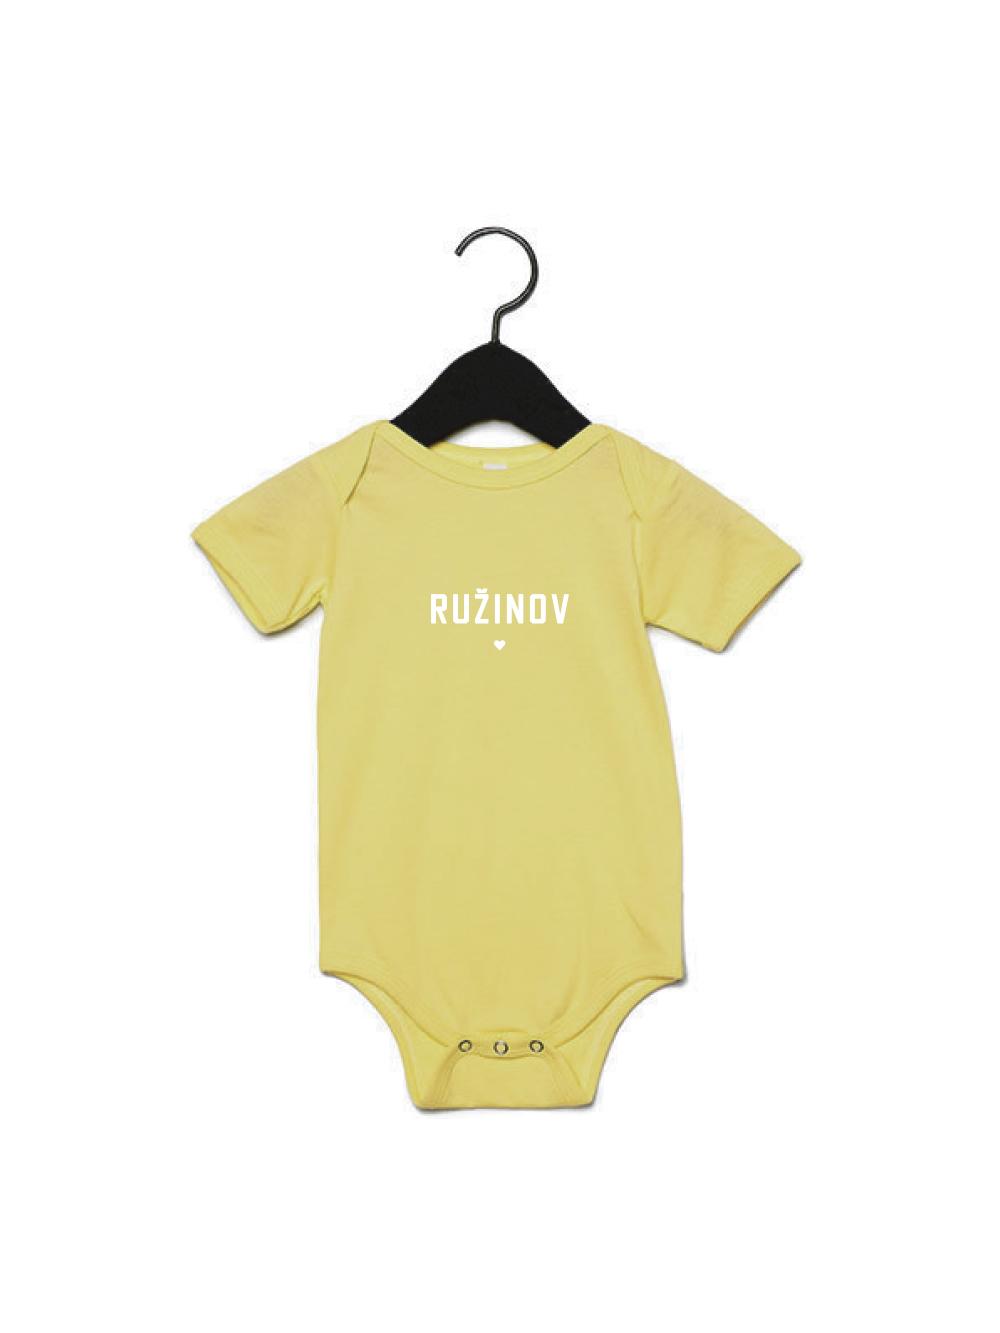 Dieťa, Žltá